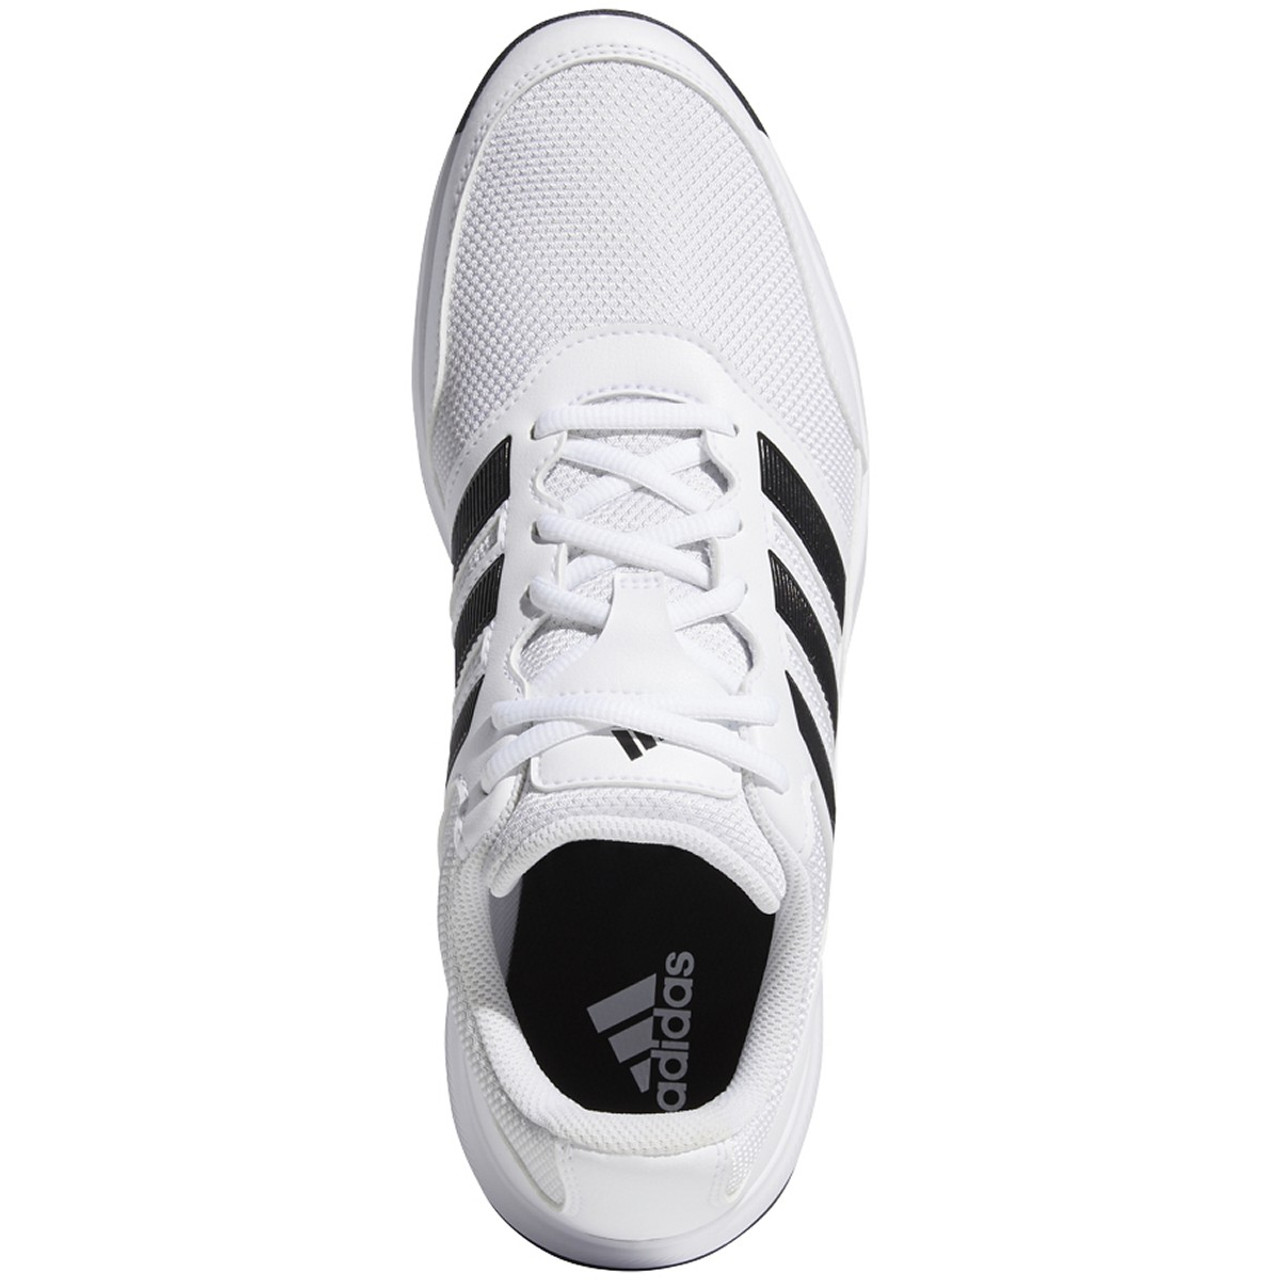 Adidas Tech Response 2.0 Golf Shoes - White / Black / White